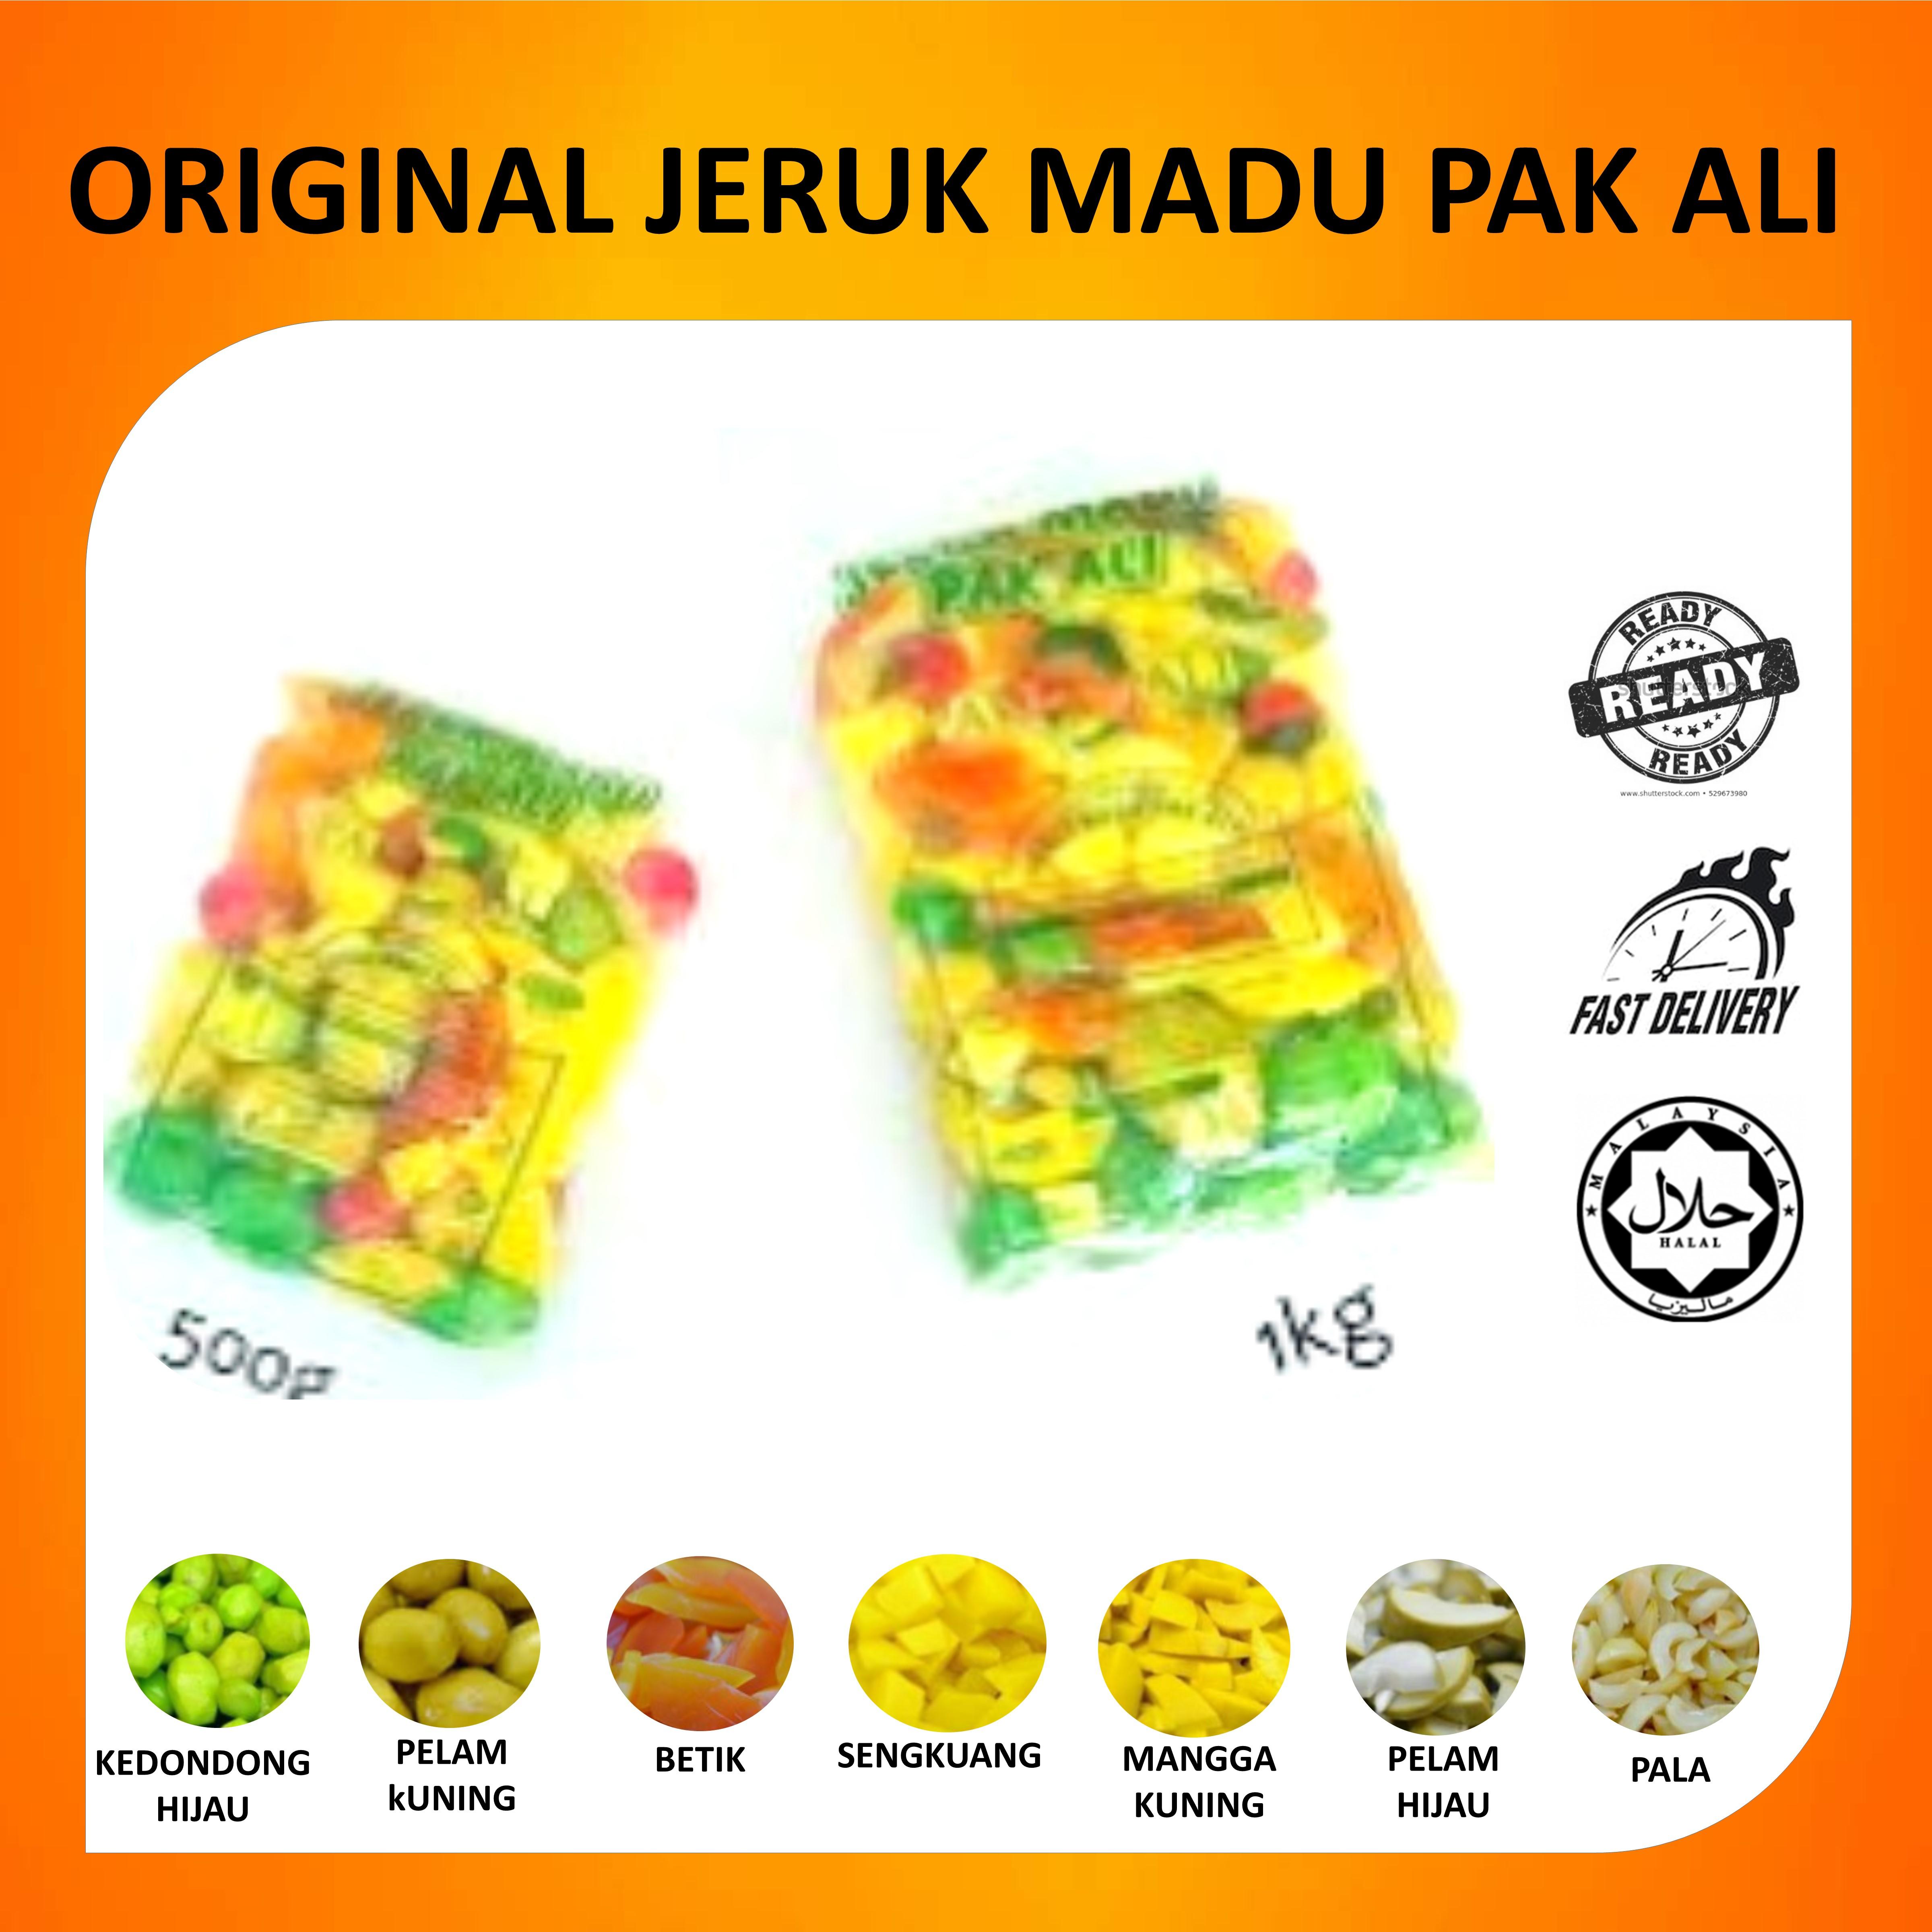 JERUK MADU PAK ALI ORIGINAL PENANG 0.5KG